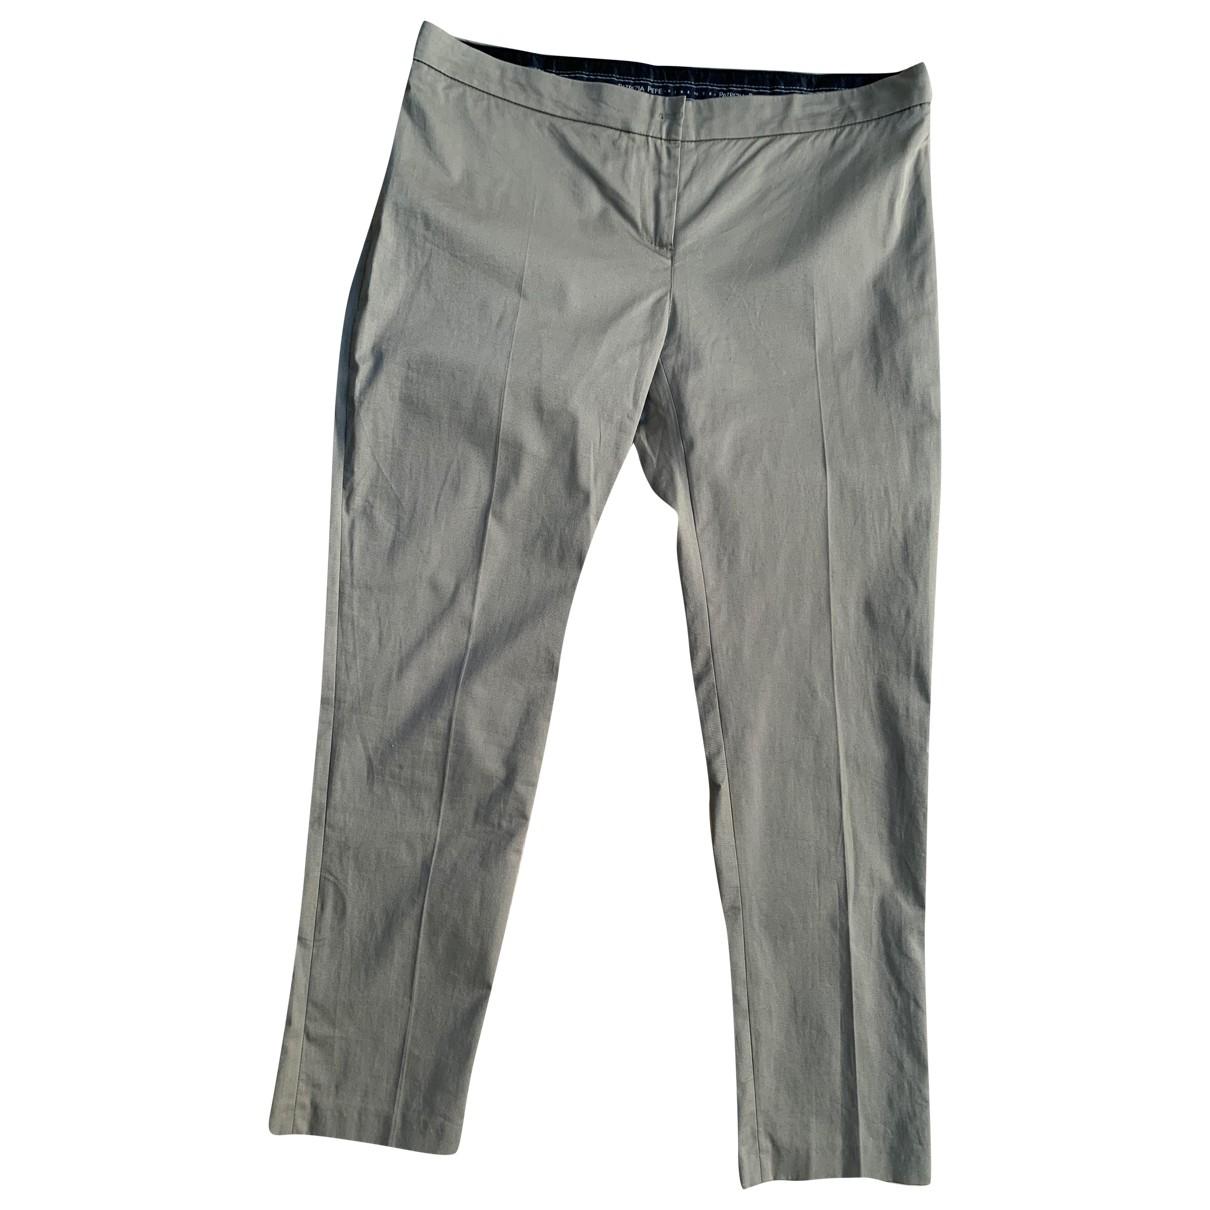 Patrizia Pepe N Green Cotton Trousers for Women L International